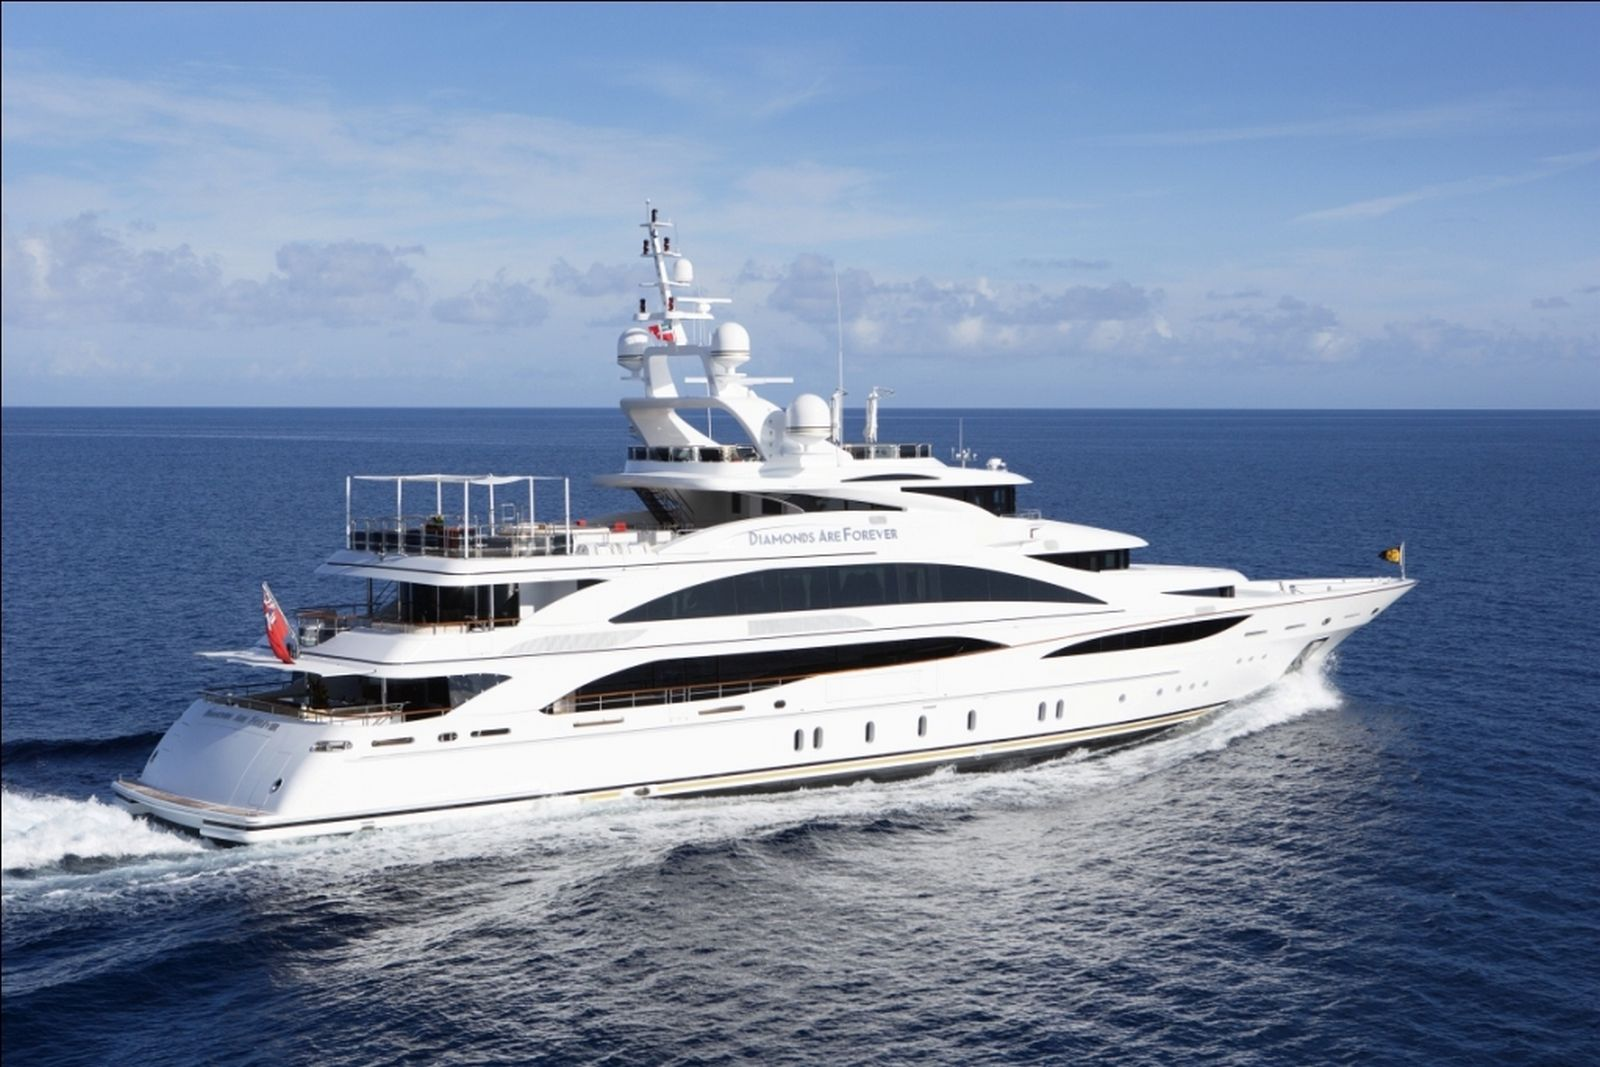 Million Dollar Yacht >> This Is What A 60 Million Yacht Looks Like Gtspirit